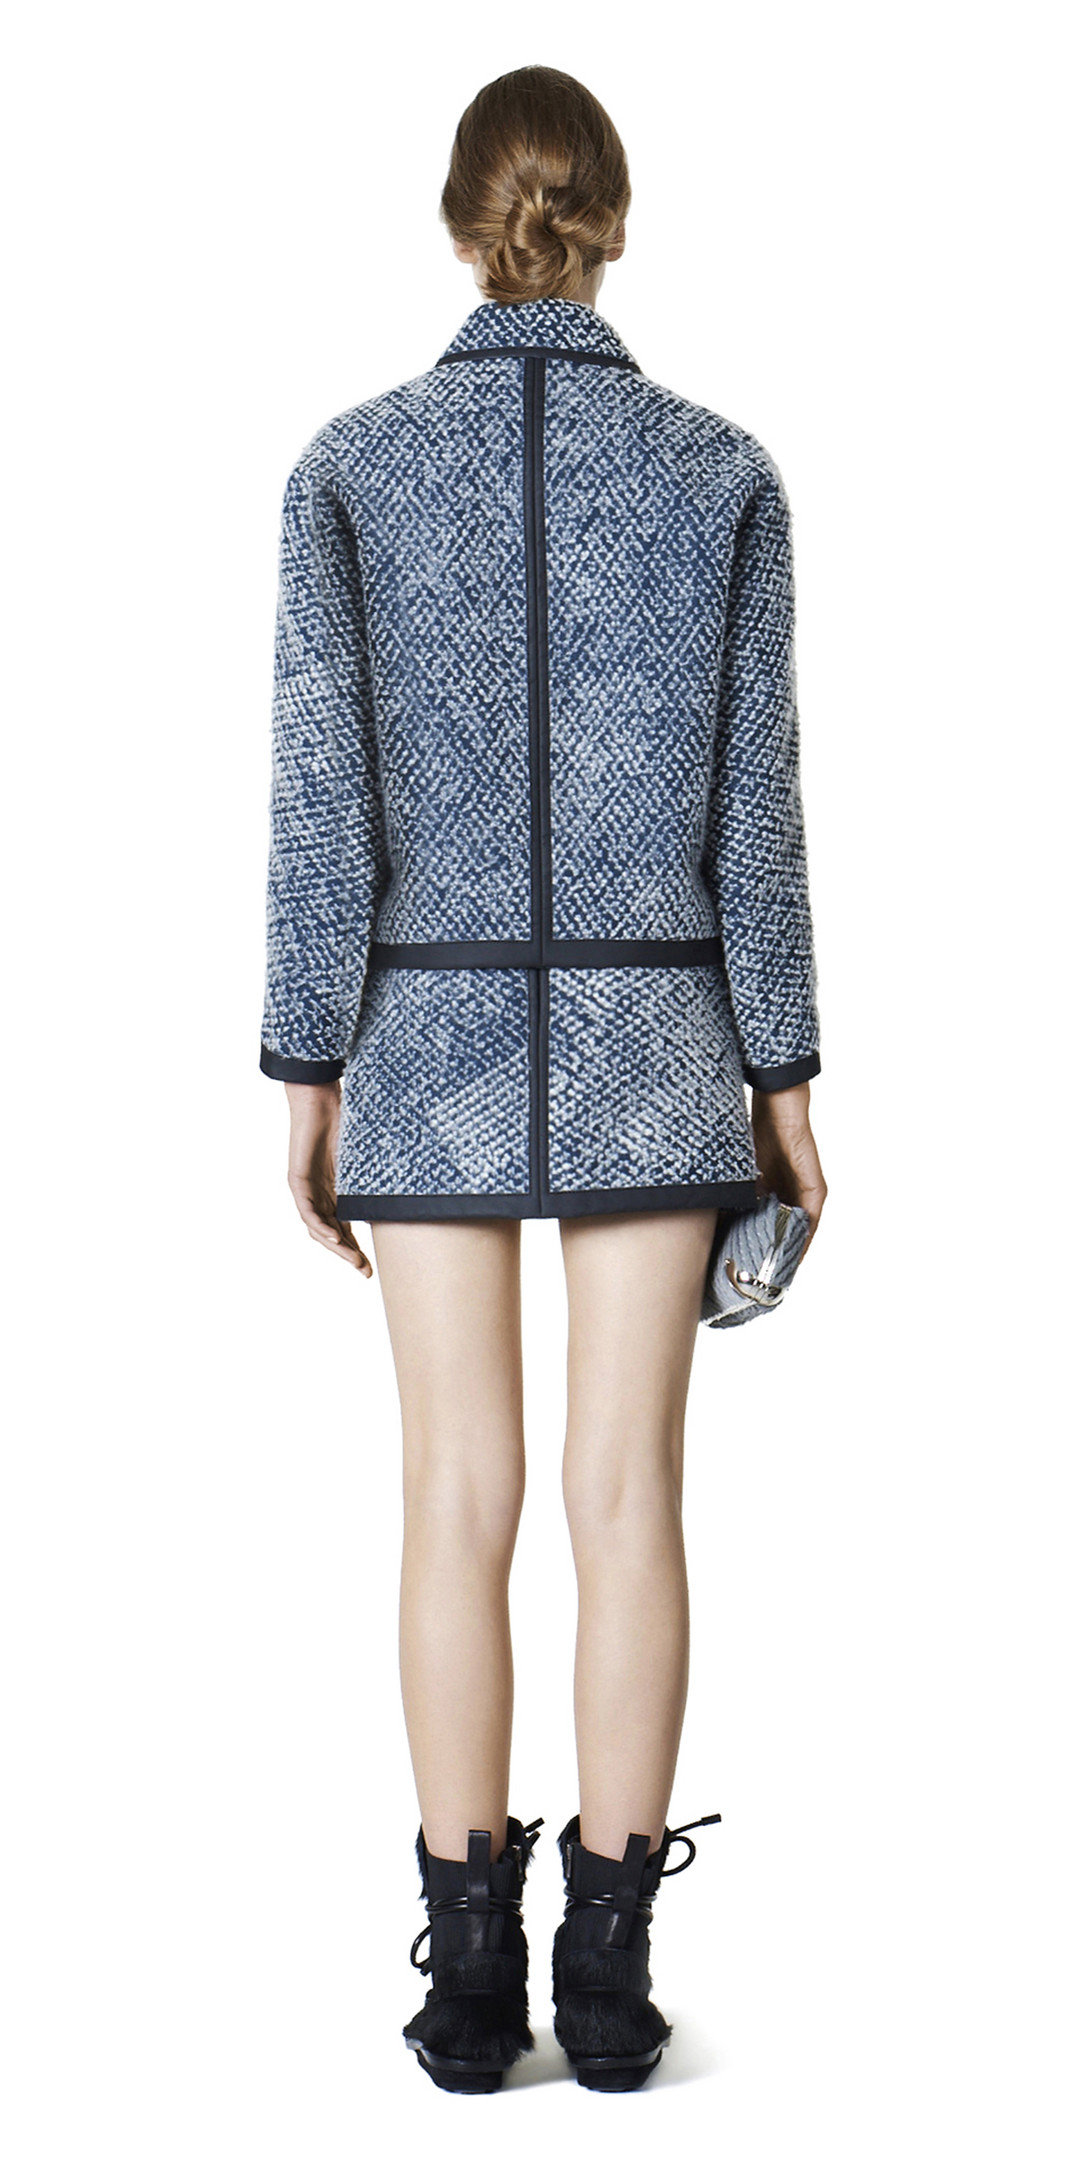 BALENCIAGA Skirt D Balenciaga Urban Mini Skirt i